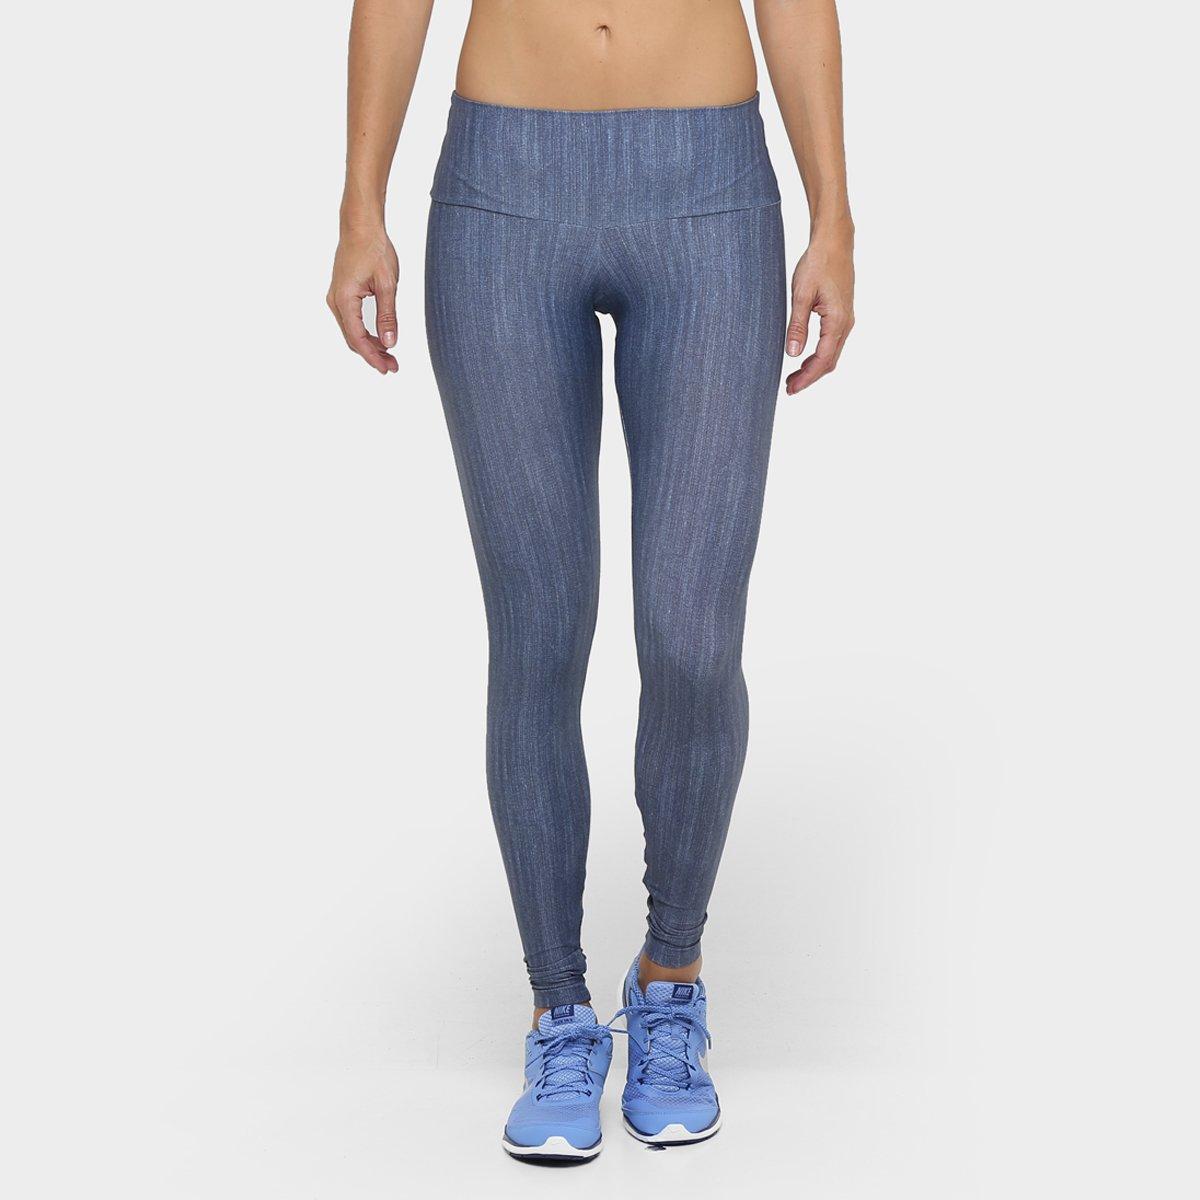 Calça Jeans Live Jeans Like Legging Fusô Fusô Calça Live Legging Azul Like RBUSHq